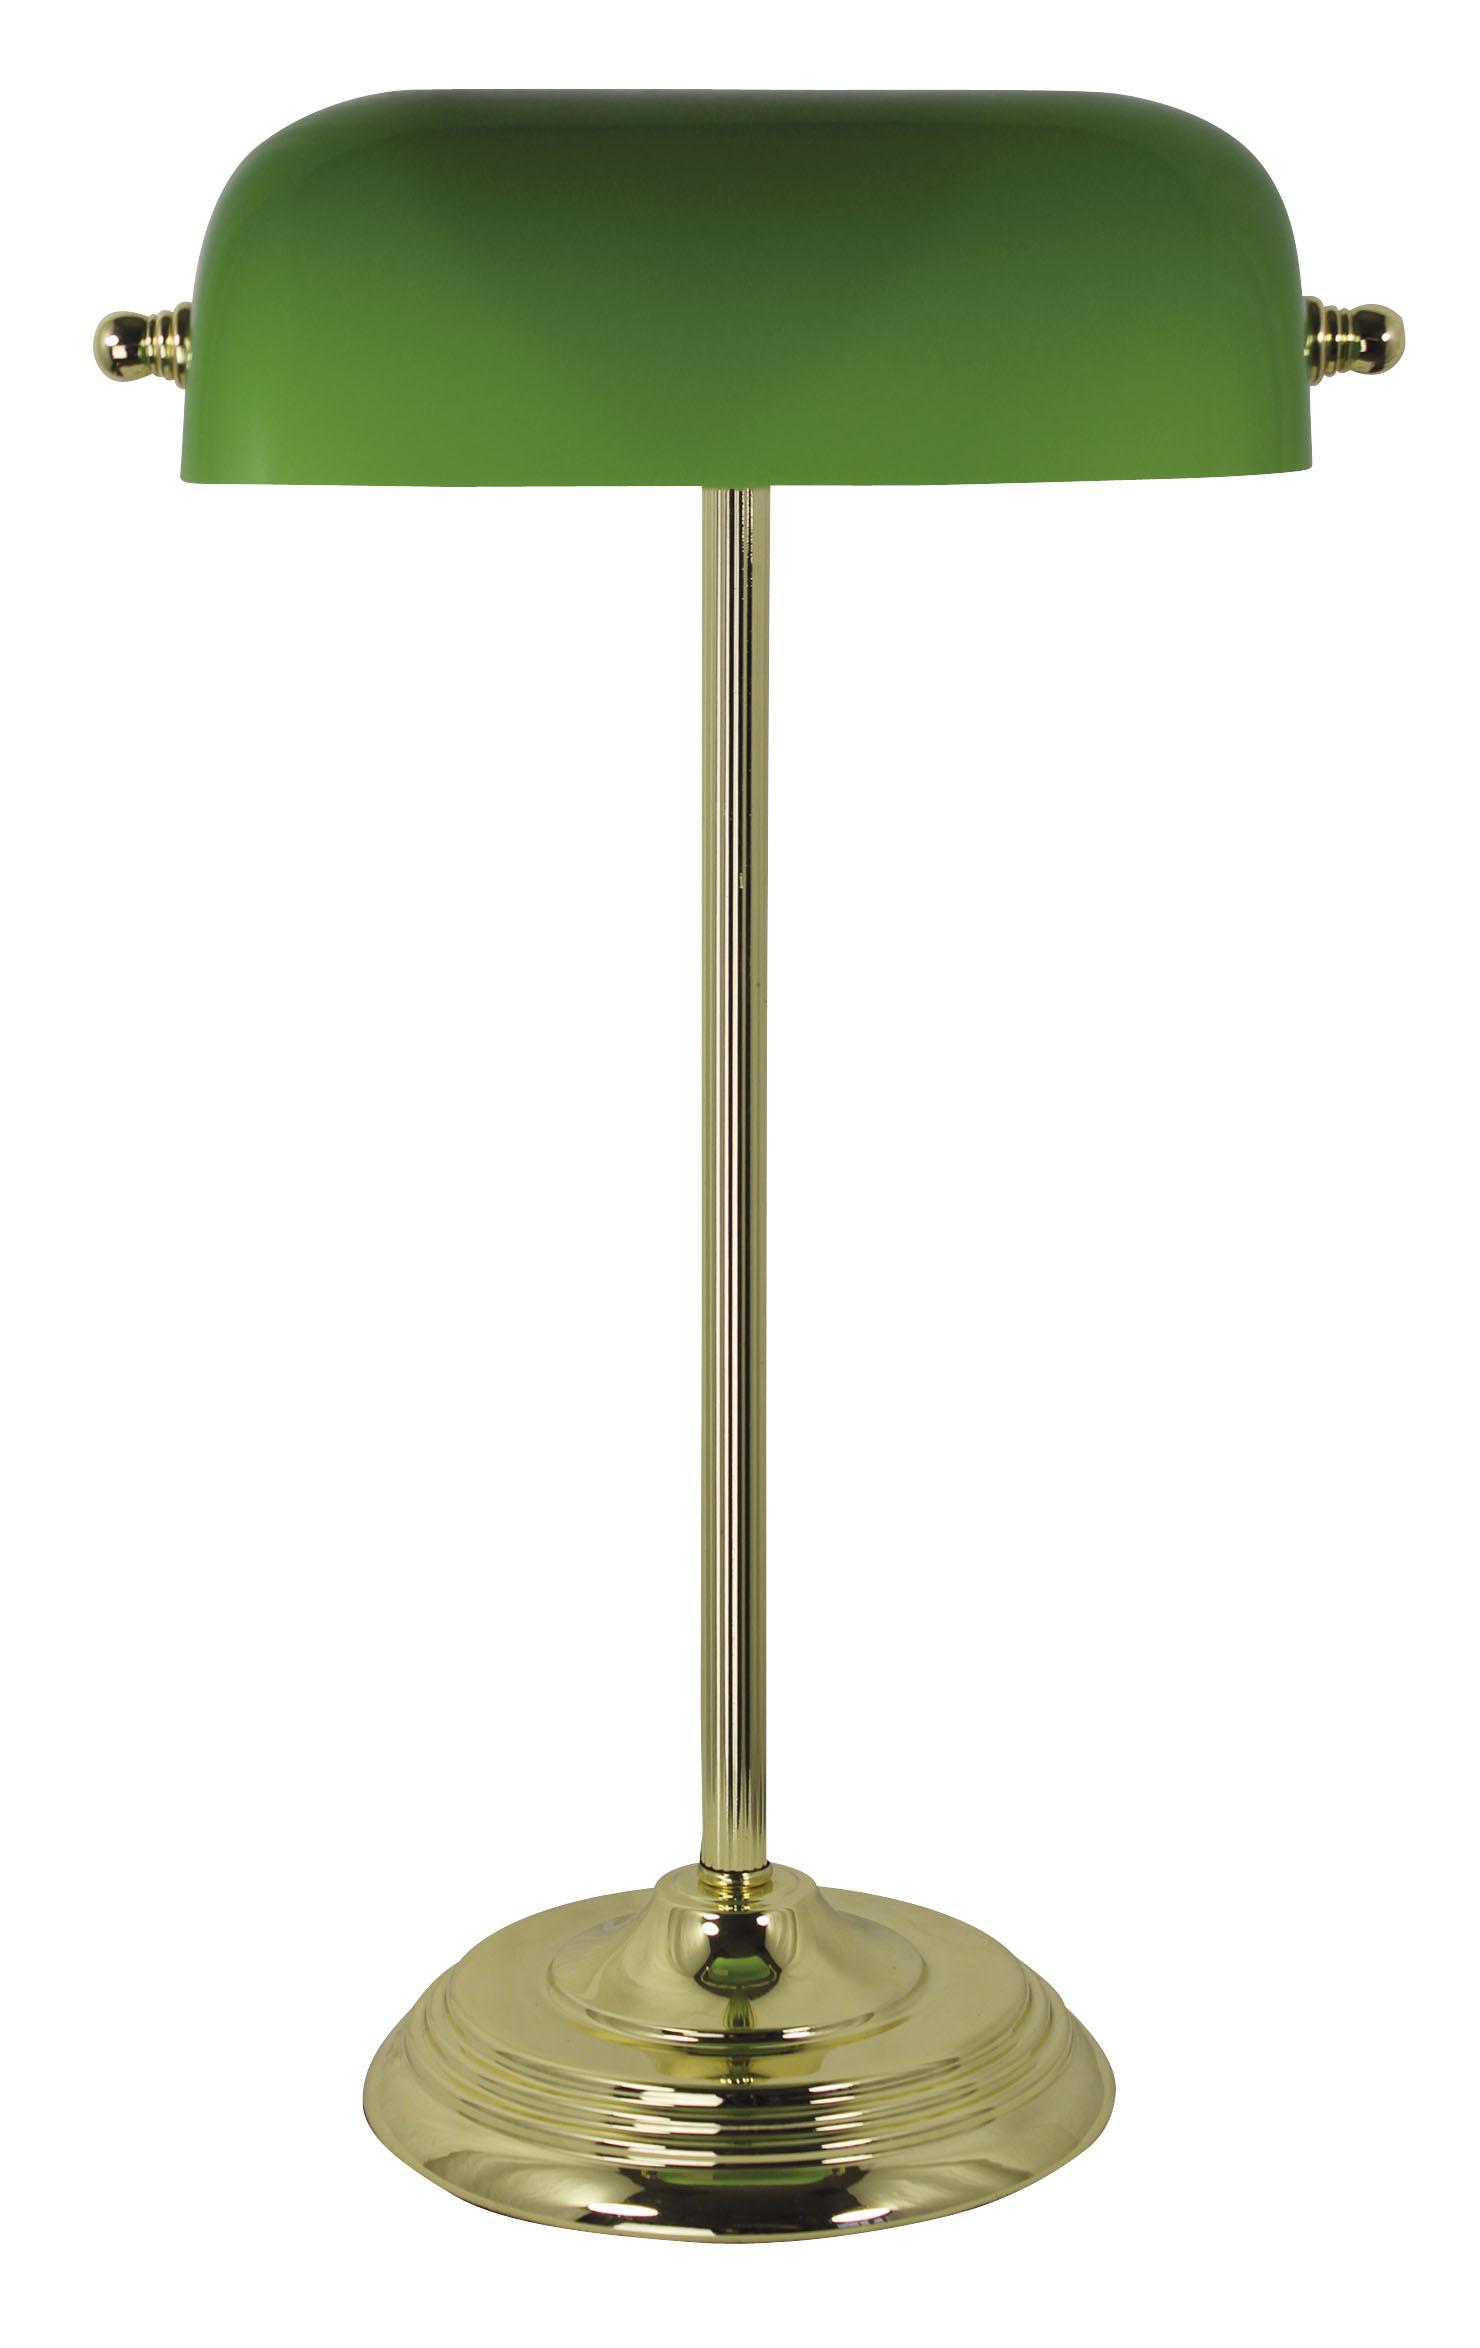 Bankers Lampe, Messing mit grünem Glasschirm H 46cm